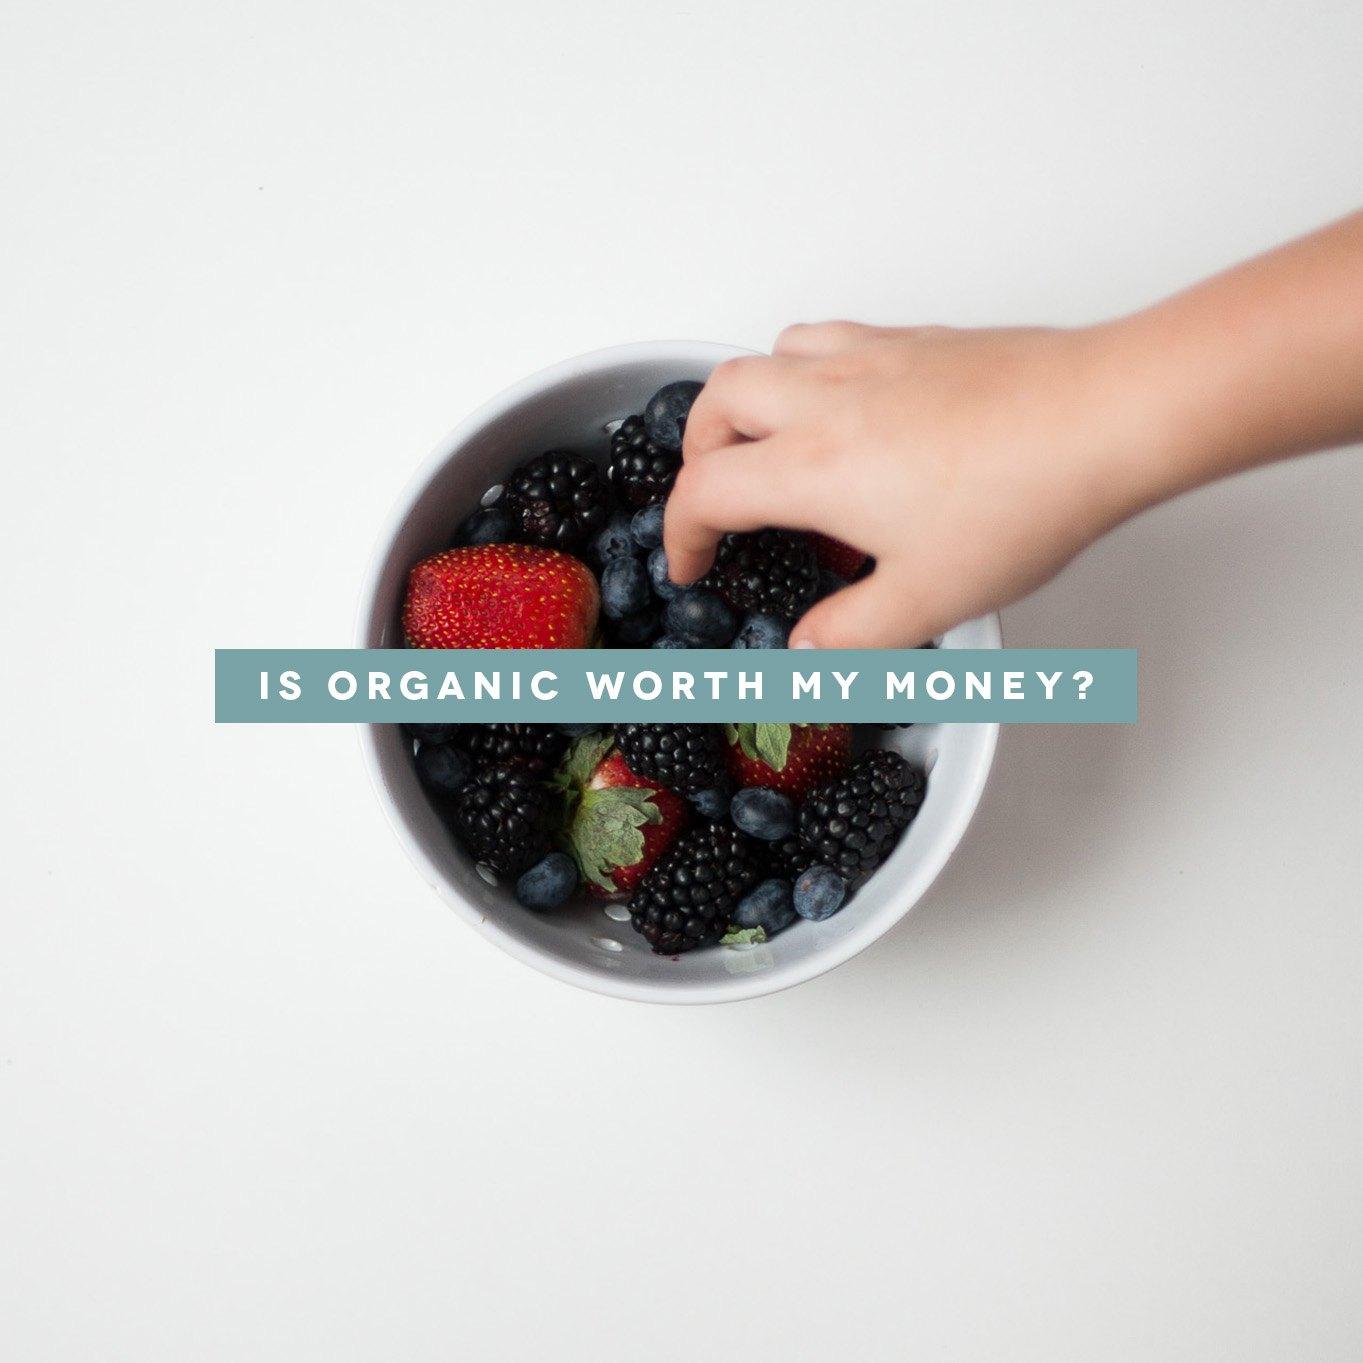 Is organic worth my money?